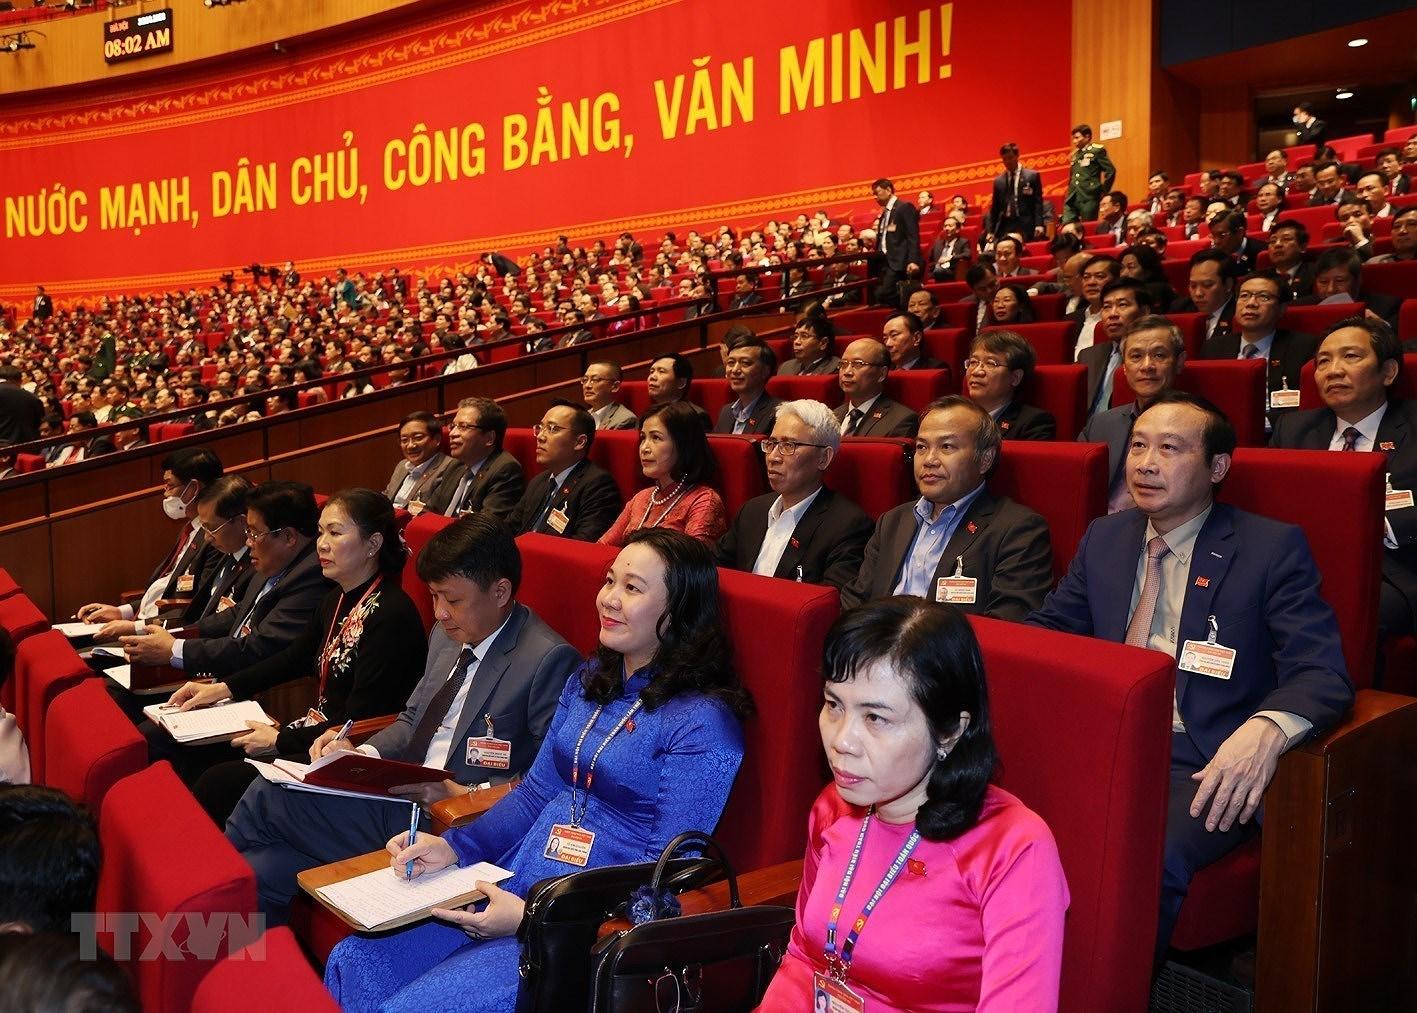 [Photo] Quang canh phien thao luan cac van kien Dai hoi XIII cua Dang hinh anh 8